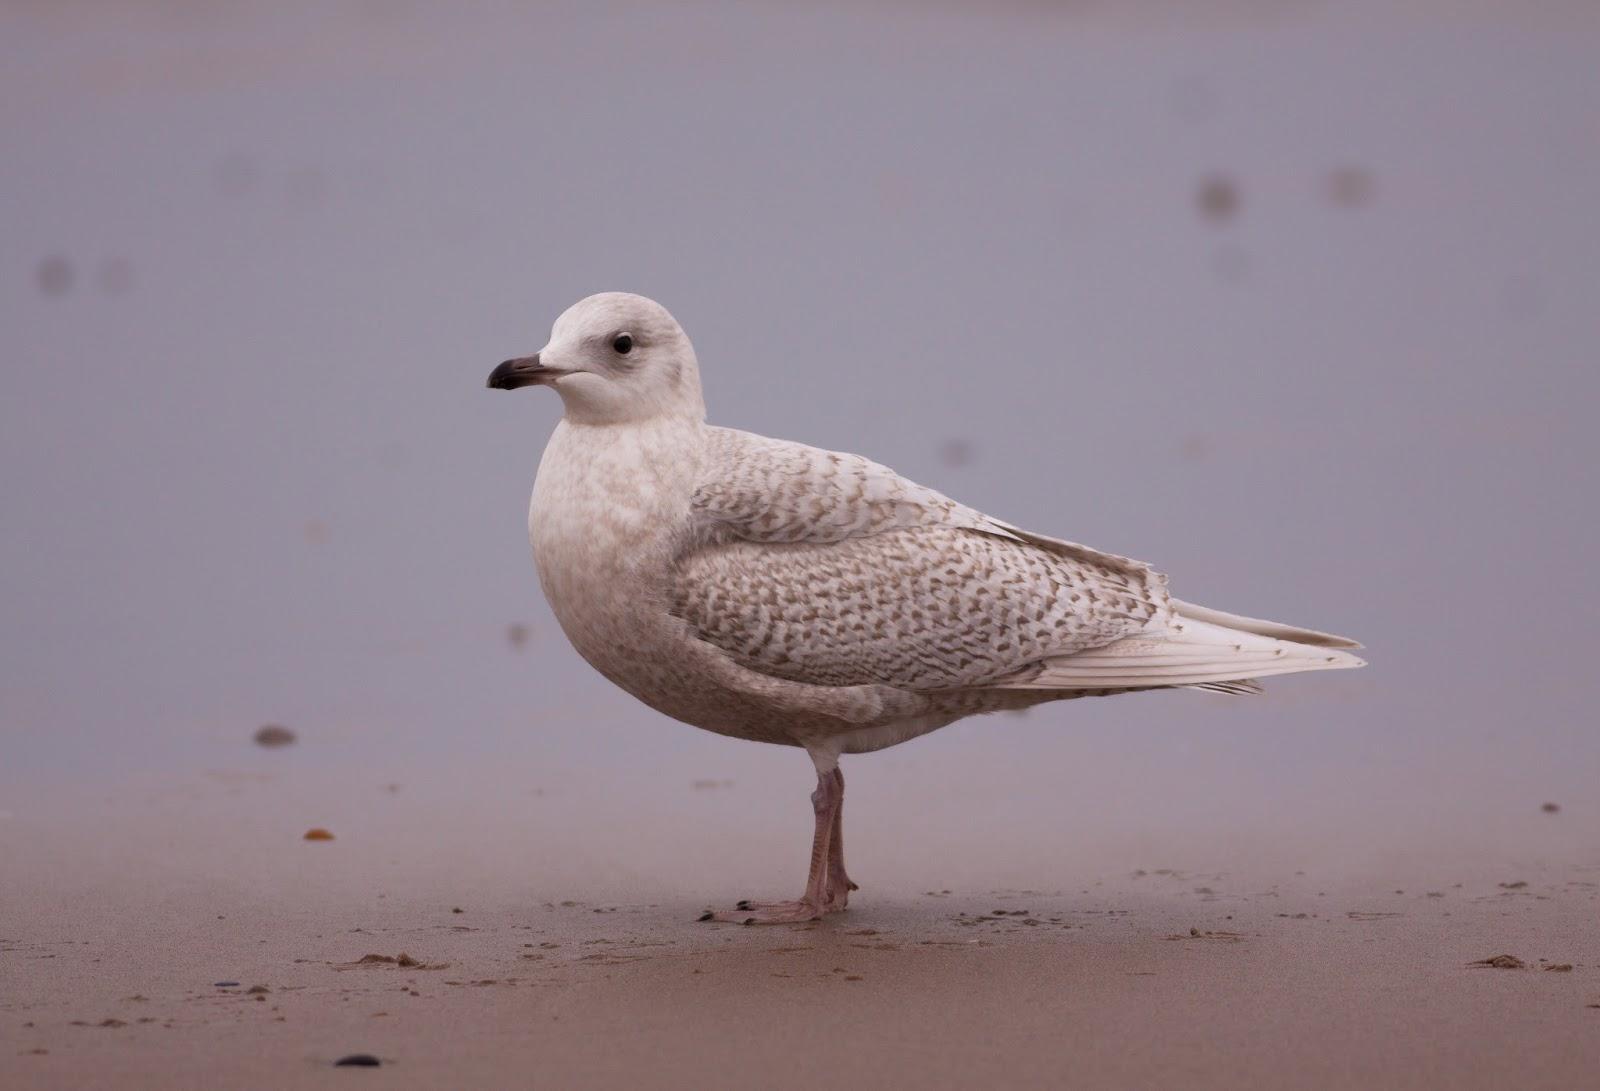 Iceland Gull - Pensarn, North Wales